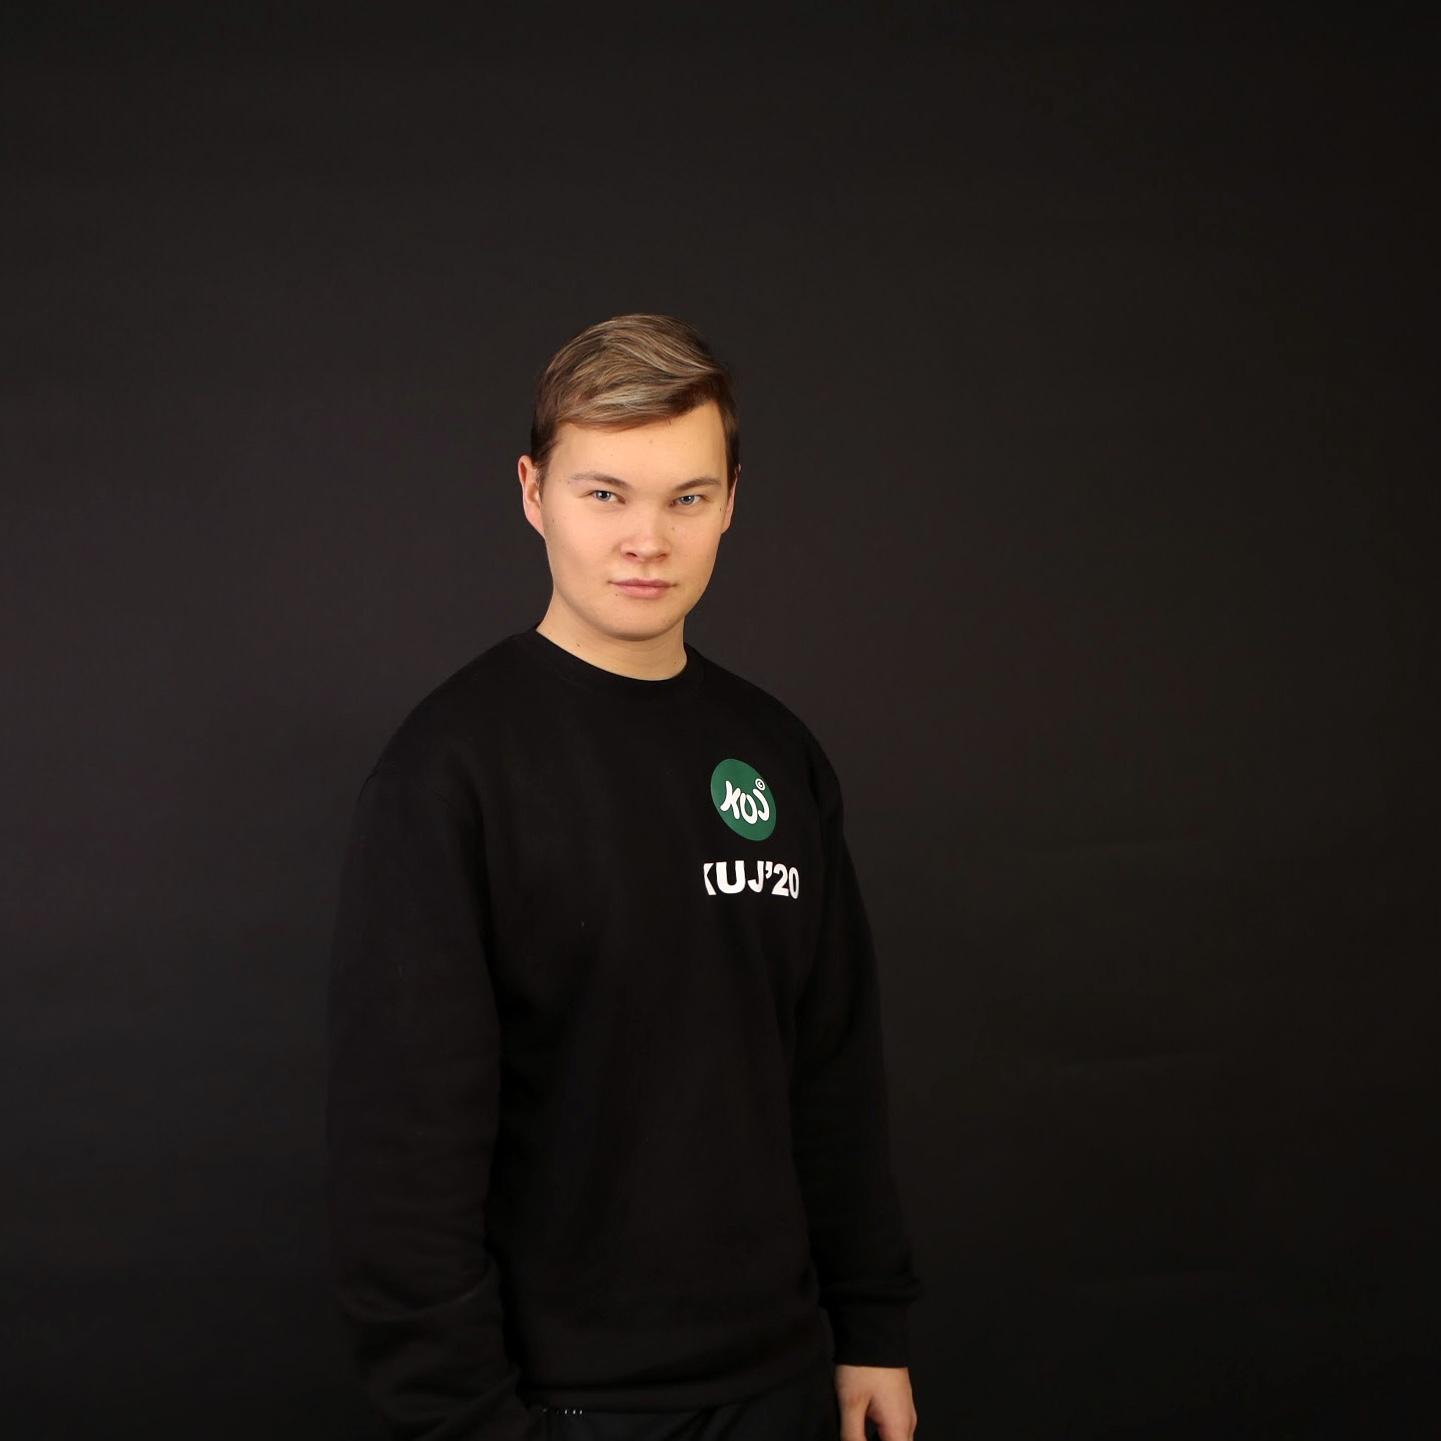 Tero Karesniemi